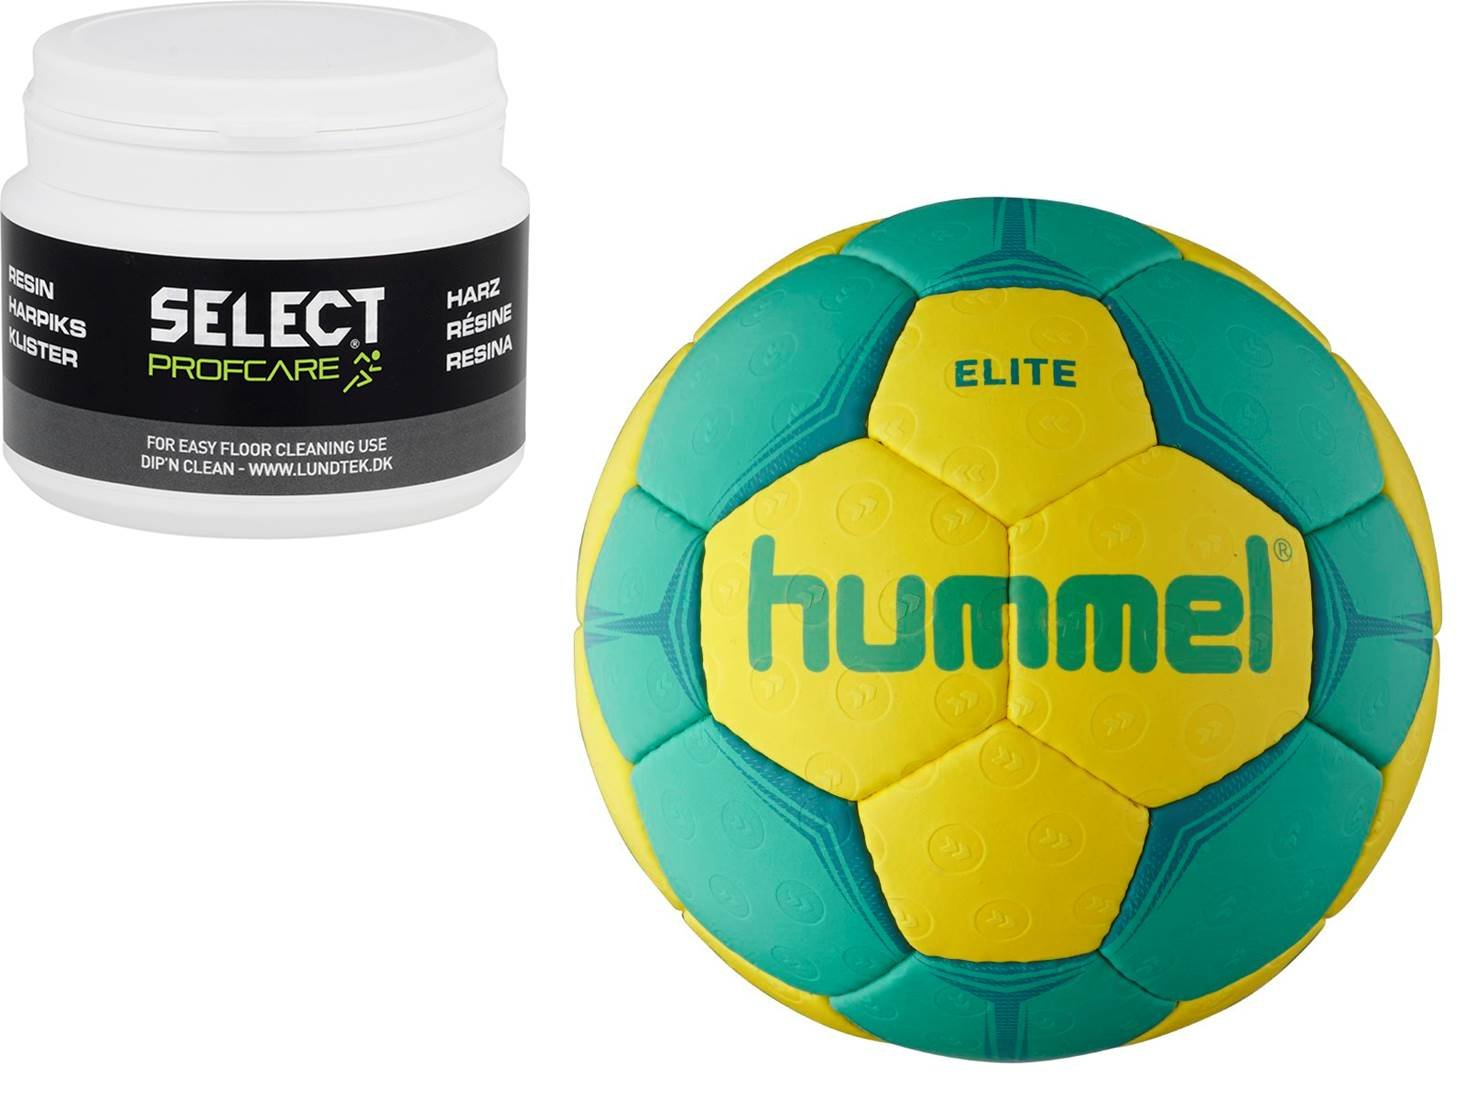 Hummel Elite de balonmano gr, 3 Select ProfCare + resina 200 ml ...